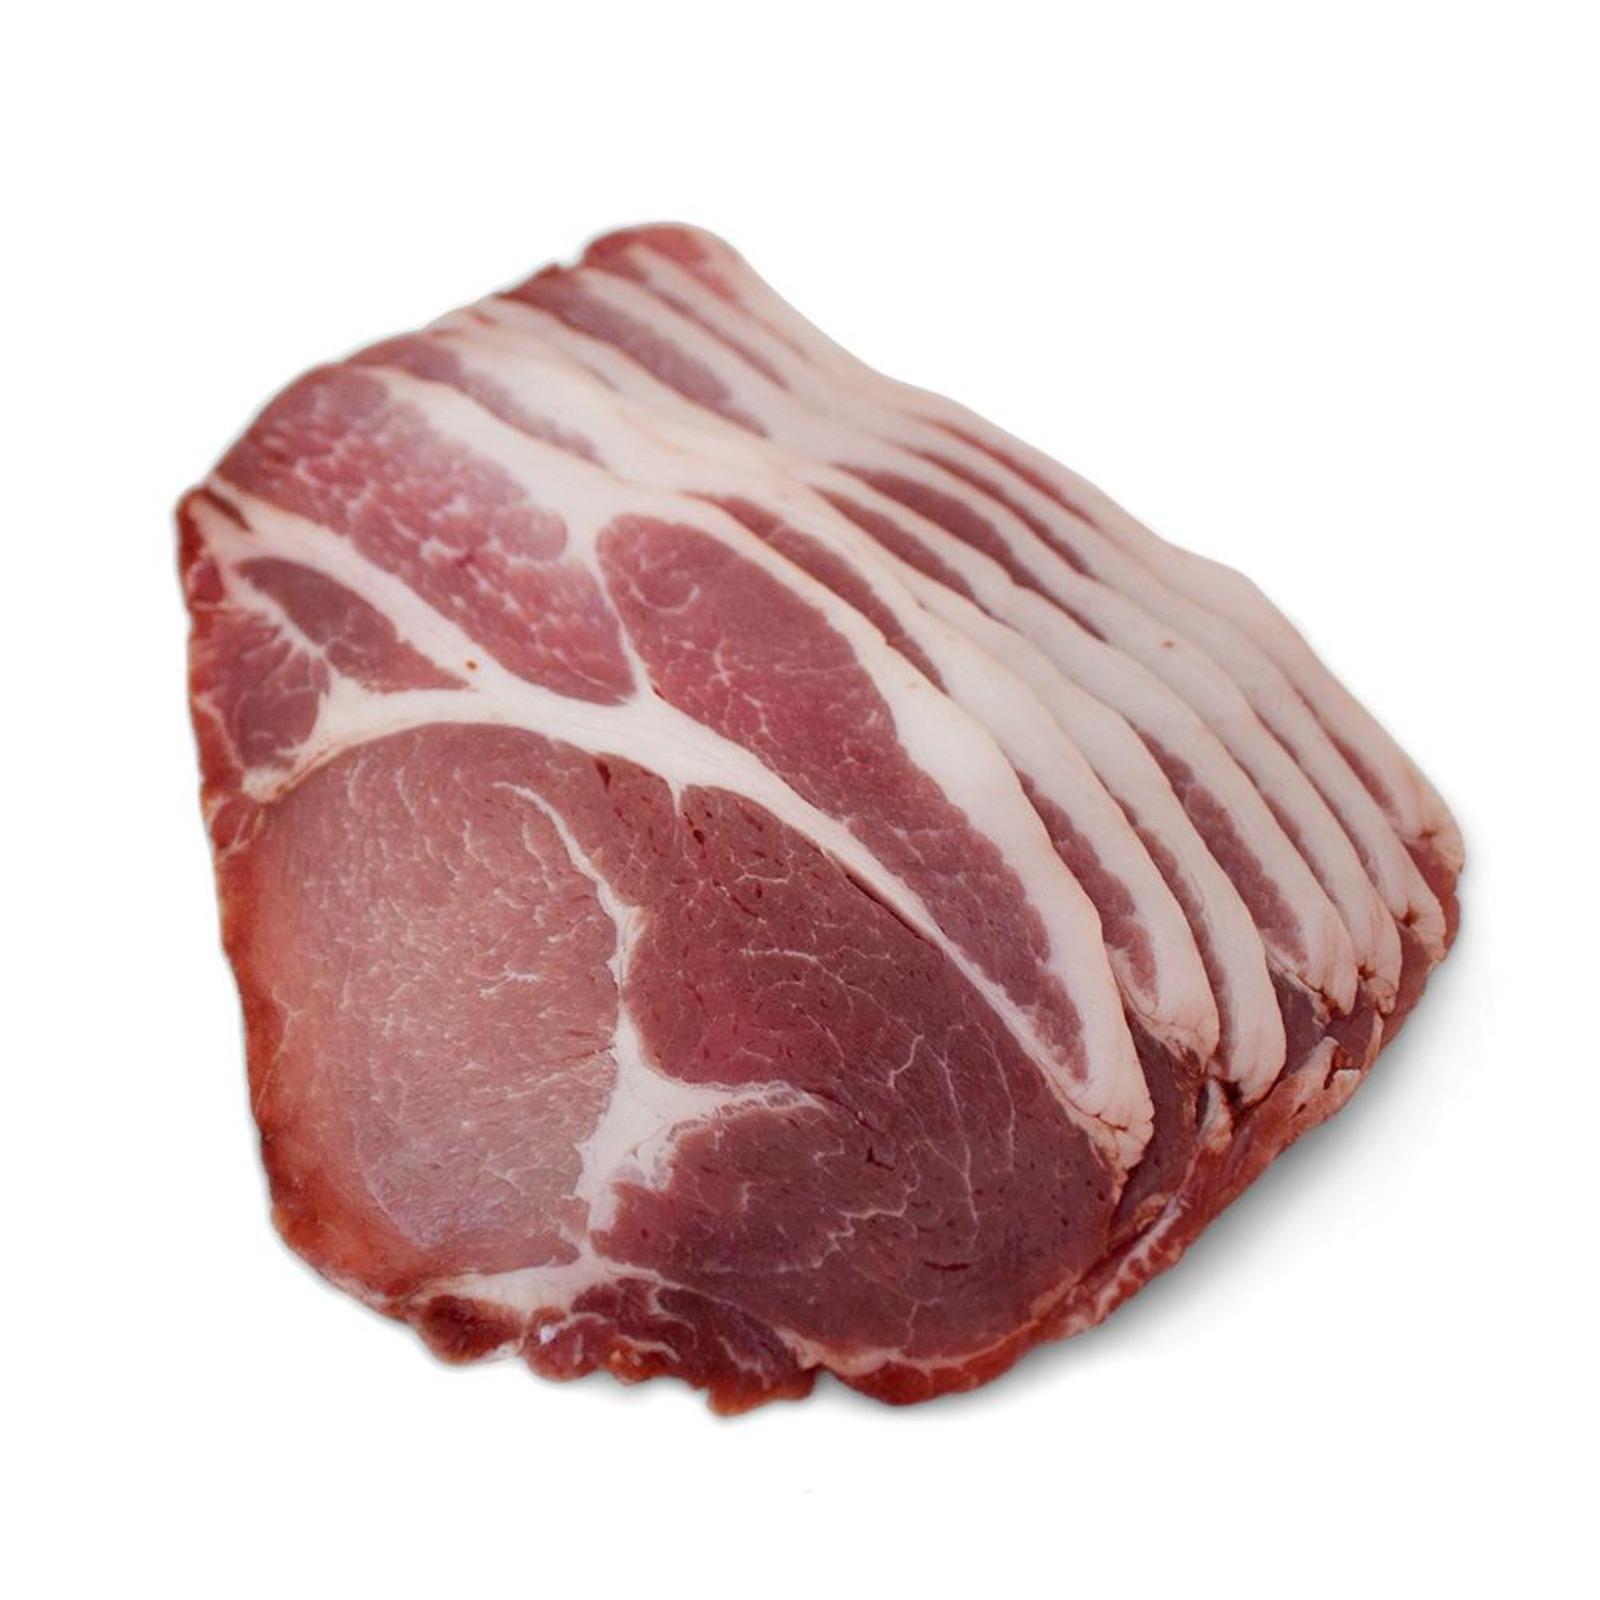 Churo Pork Back Bacon Sliced